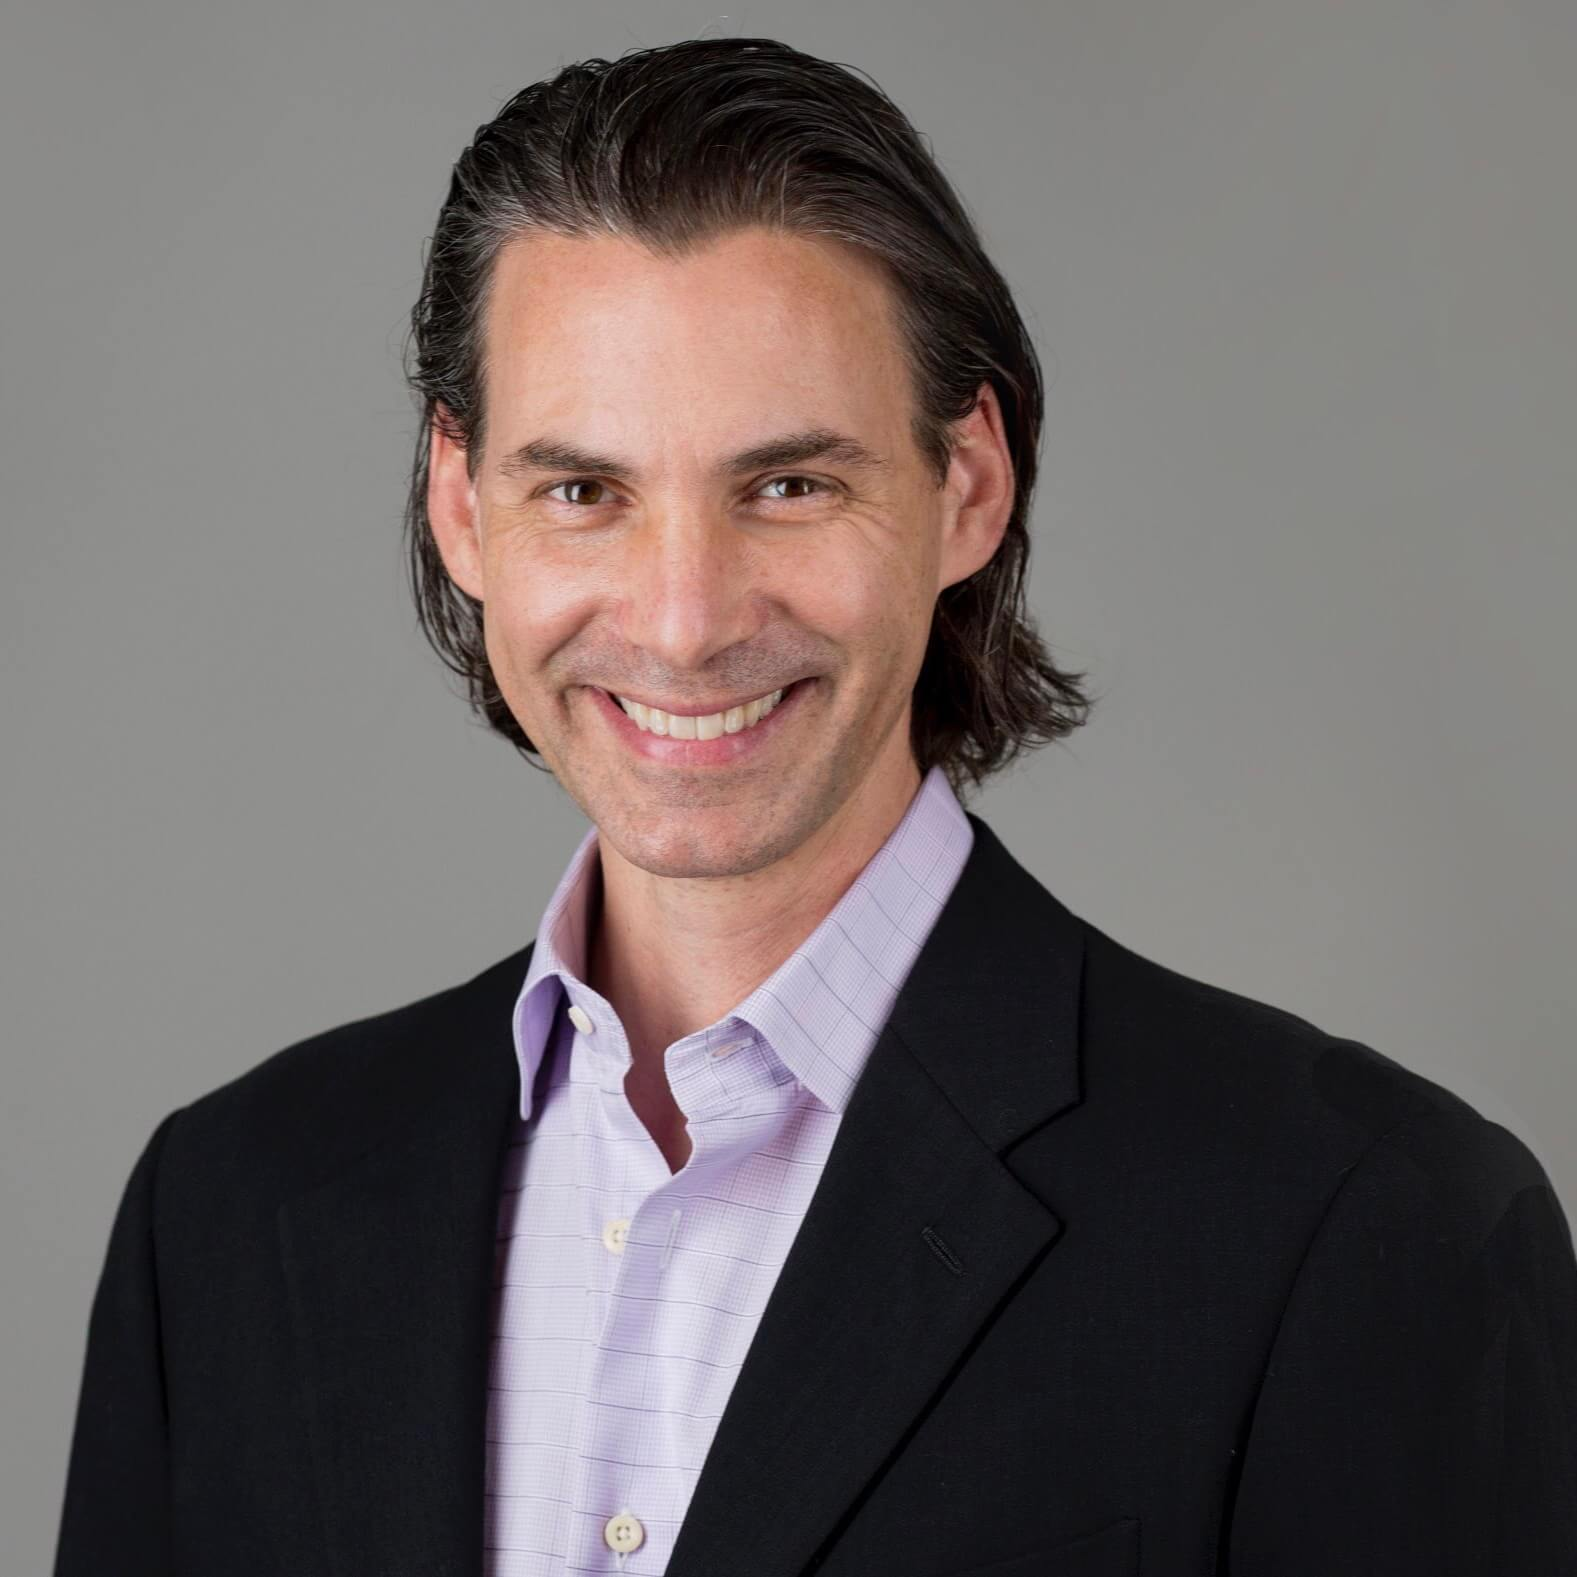 Dr. Christopher Donato, DMD